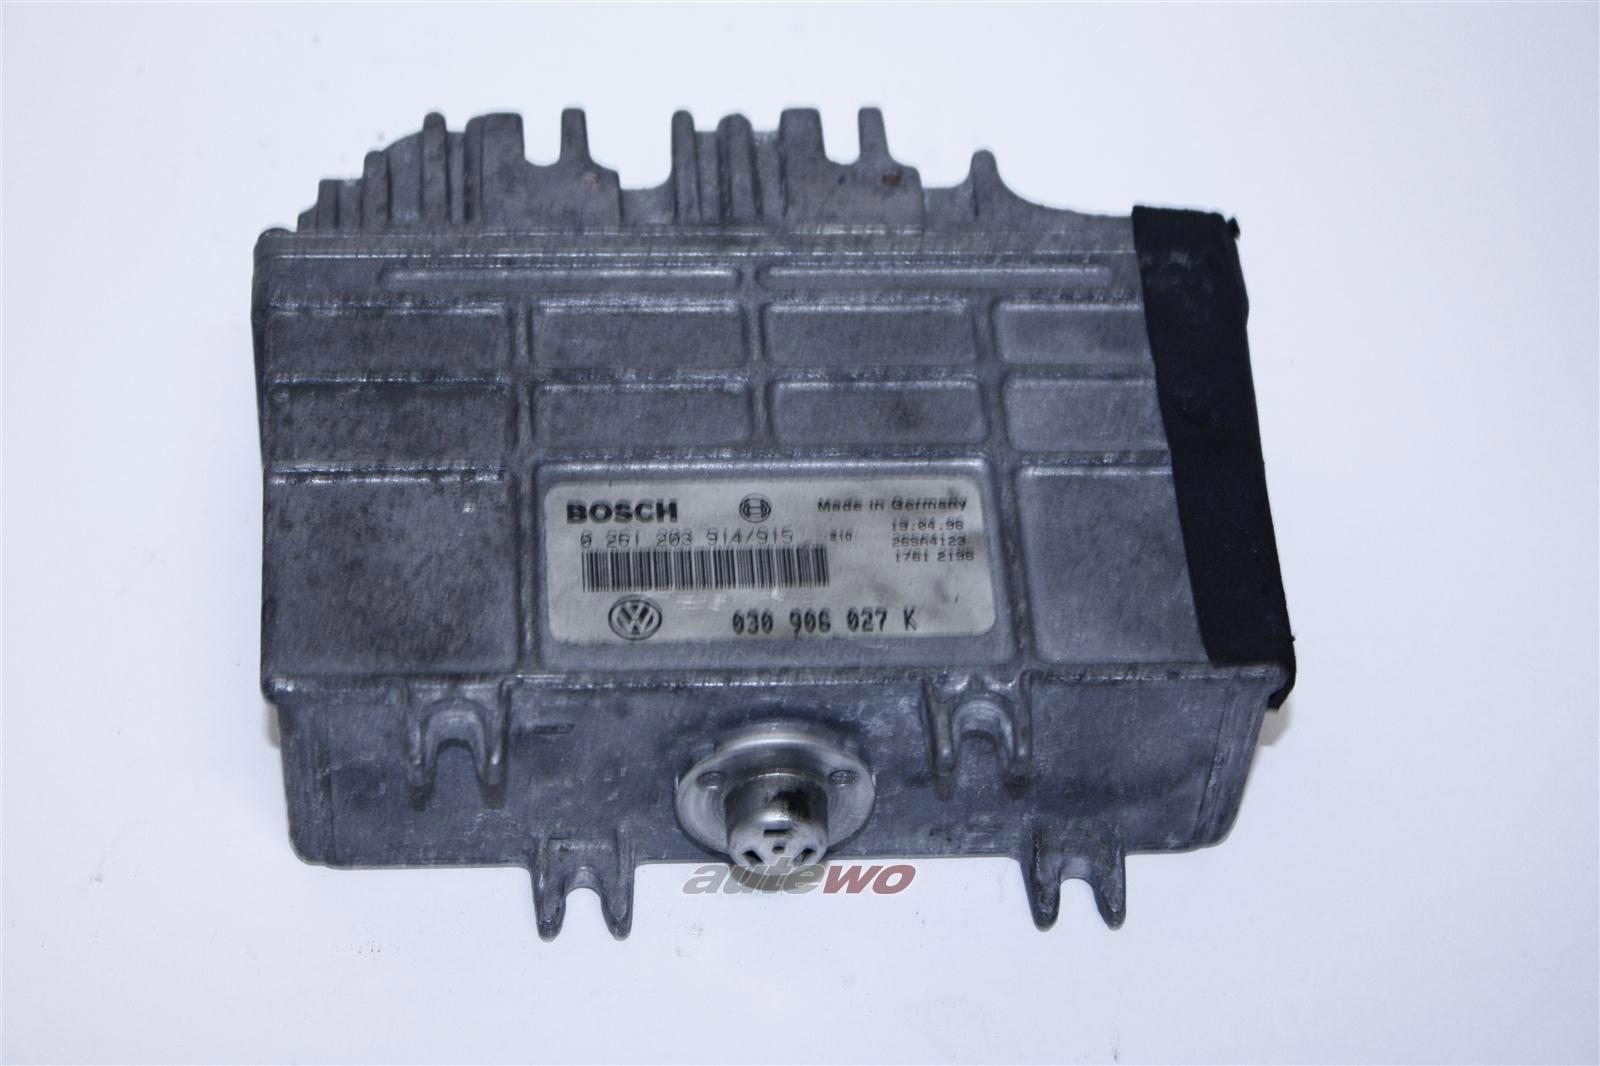 Audi/VW Polo 1.4l 60PS AEX/APQ/ANX Motorsteuergerät 030906027K 030997027 X